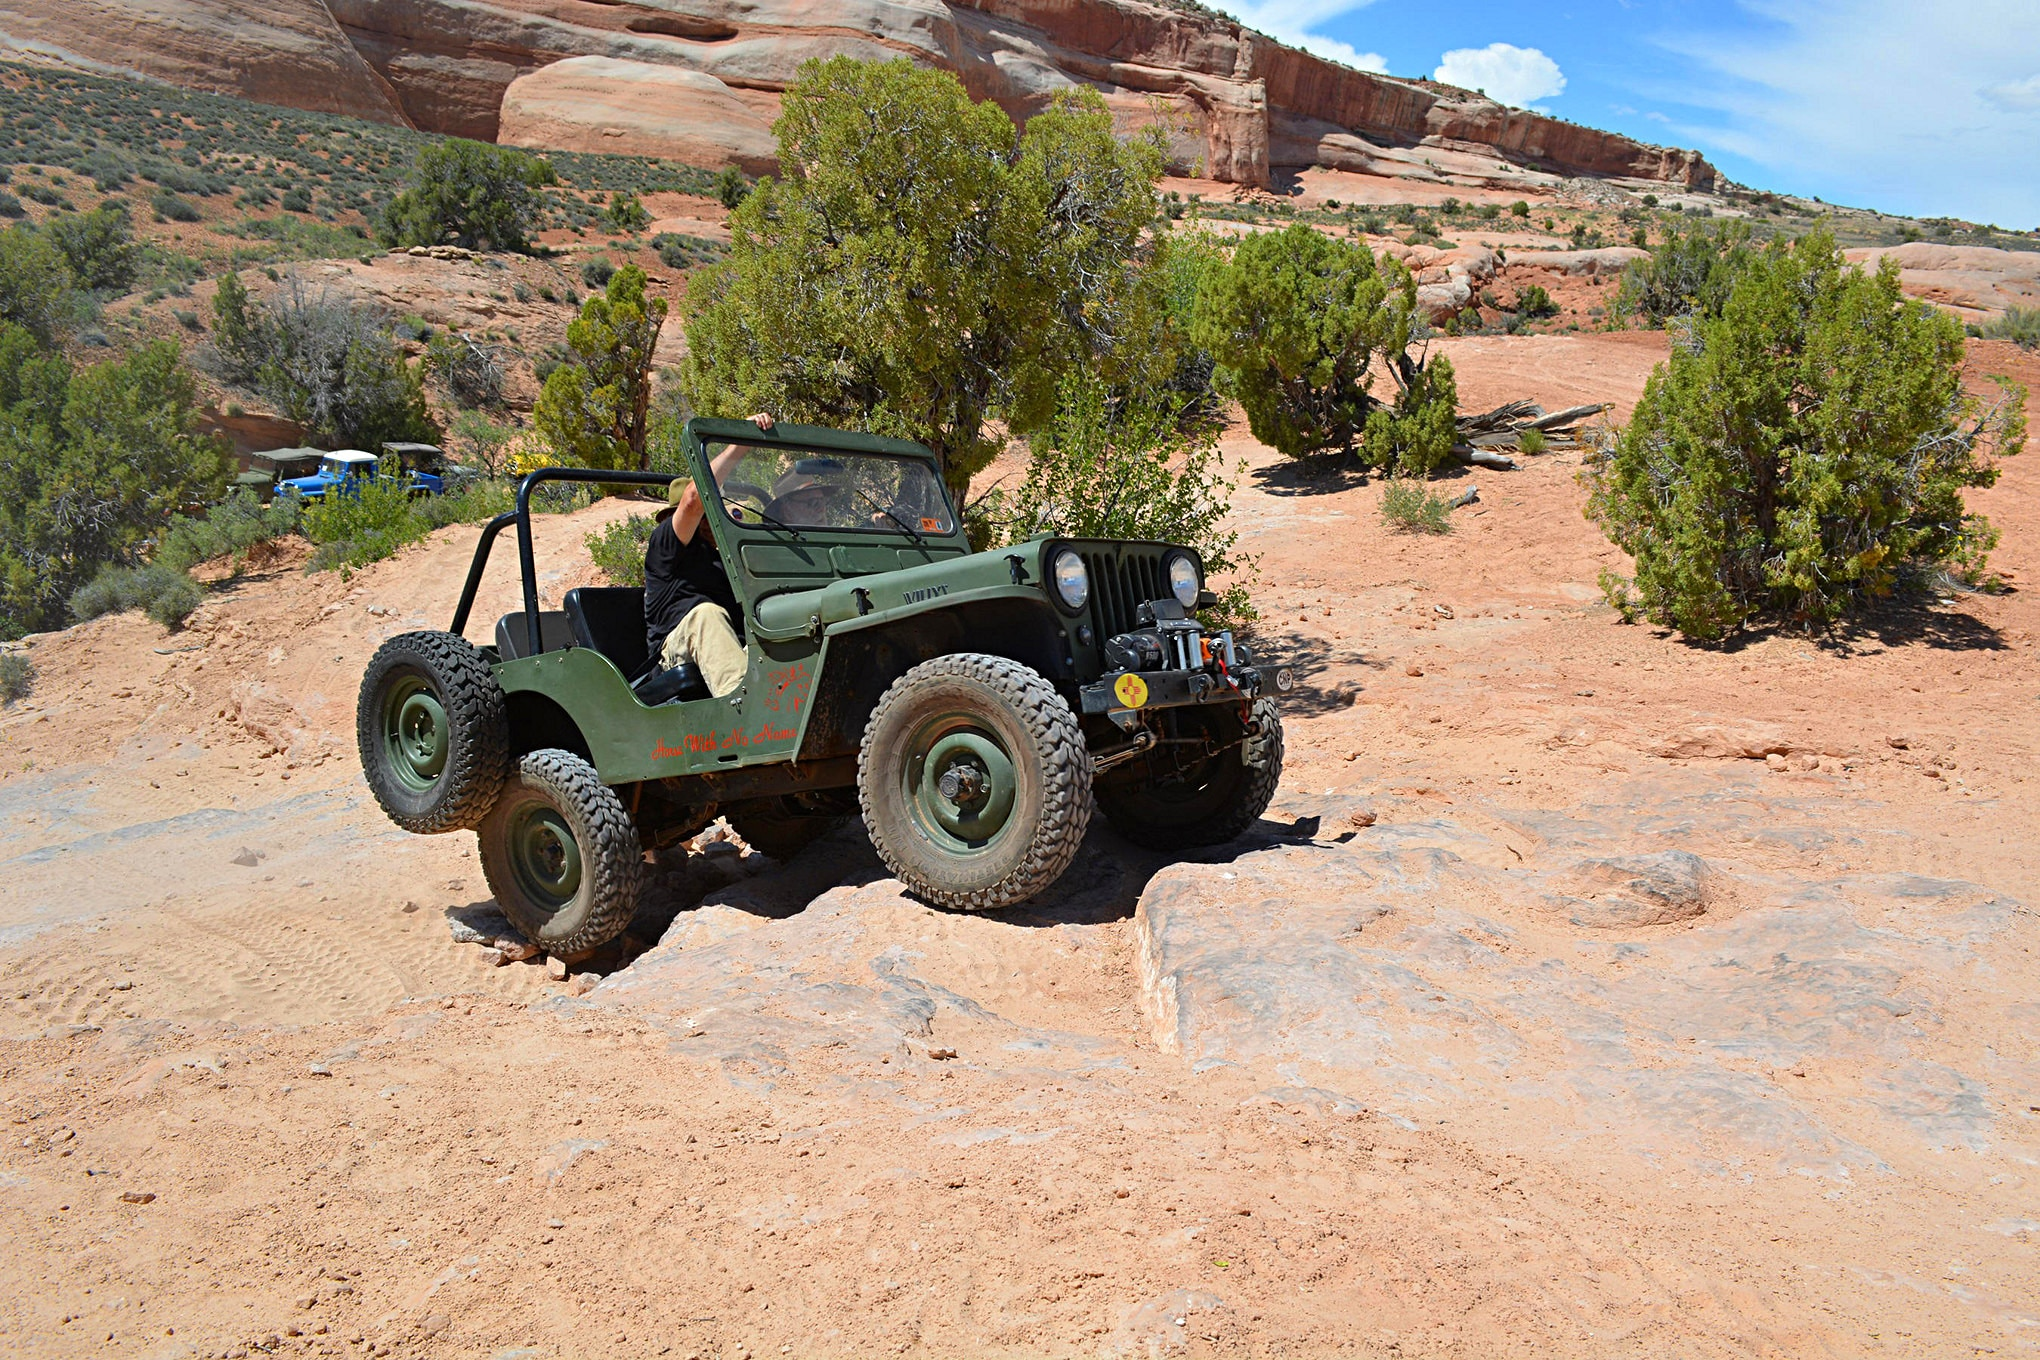 031 willys rally moab 2018 gallery.JPG